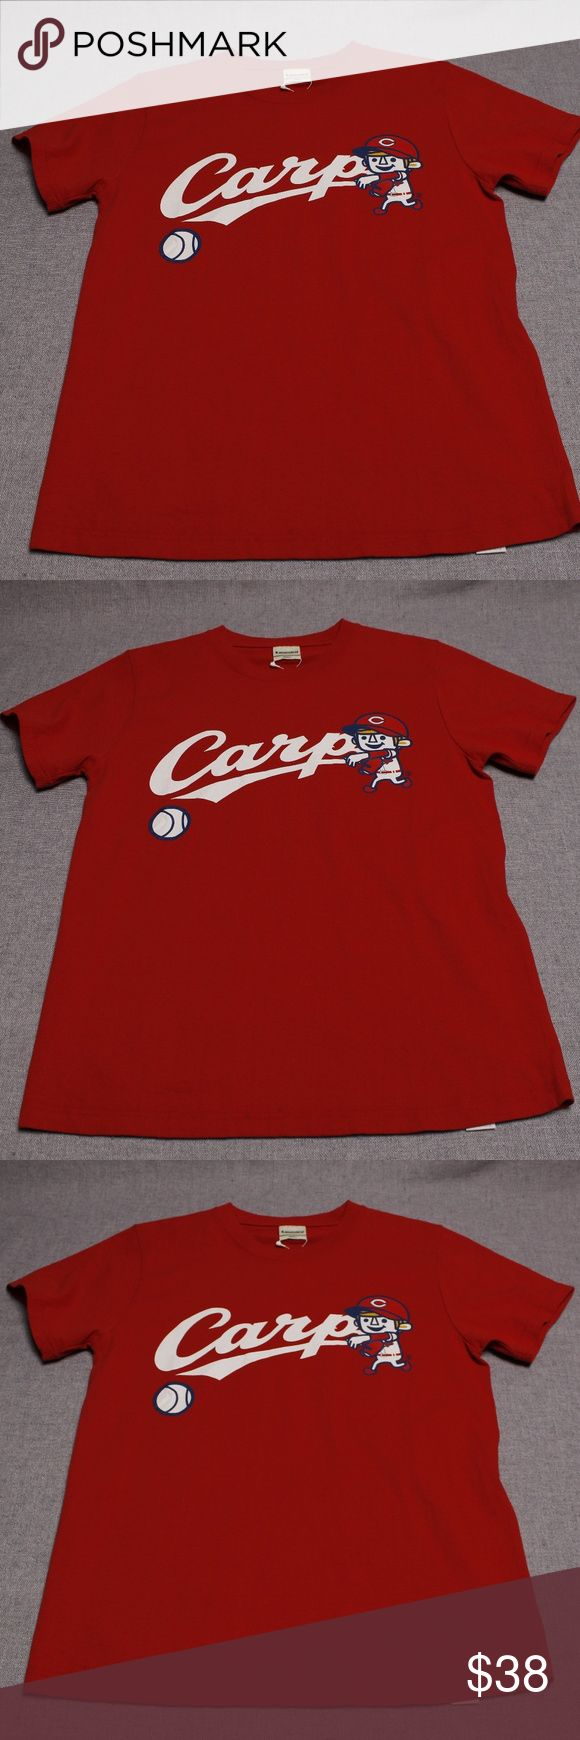 NWT Hiroshima Toyo Carp Baseball T-Shirt Hiroshima Toyo Carp Baseball T-Shirt - New with Tags! Laundry - 100% Cotton - Small Laundry Shirts Tees - Short Sleeve